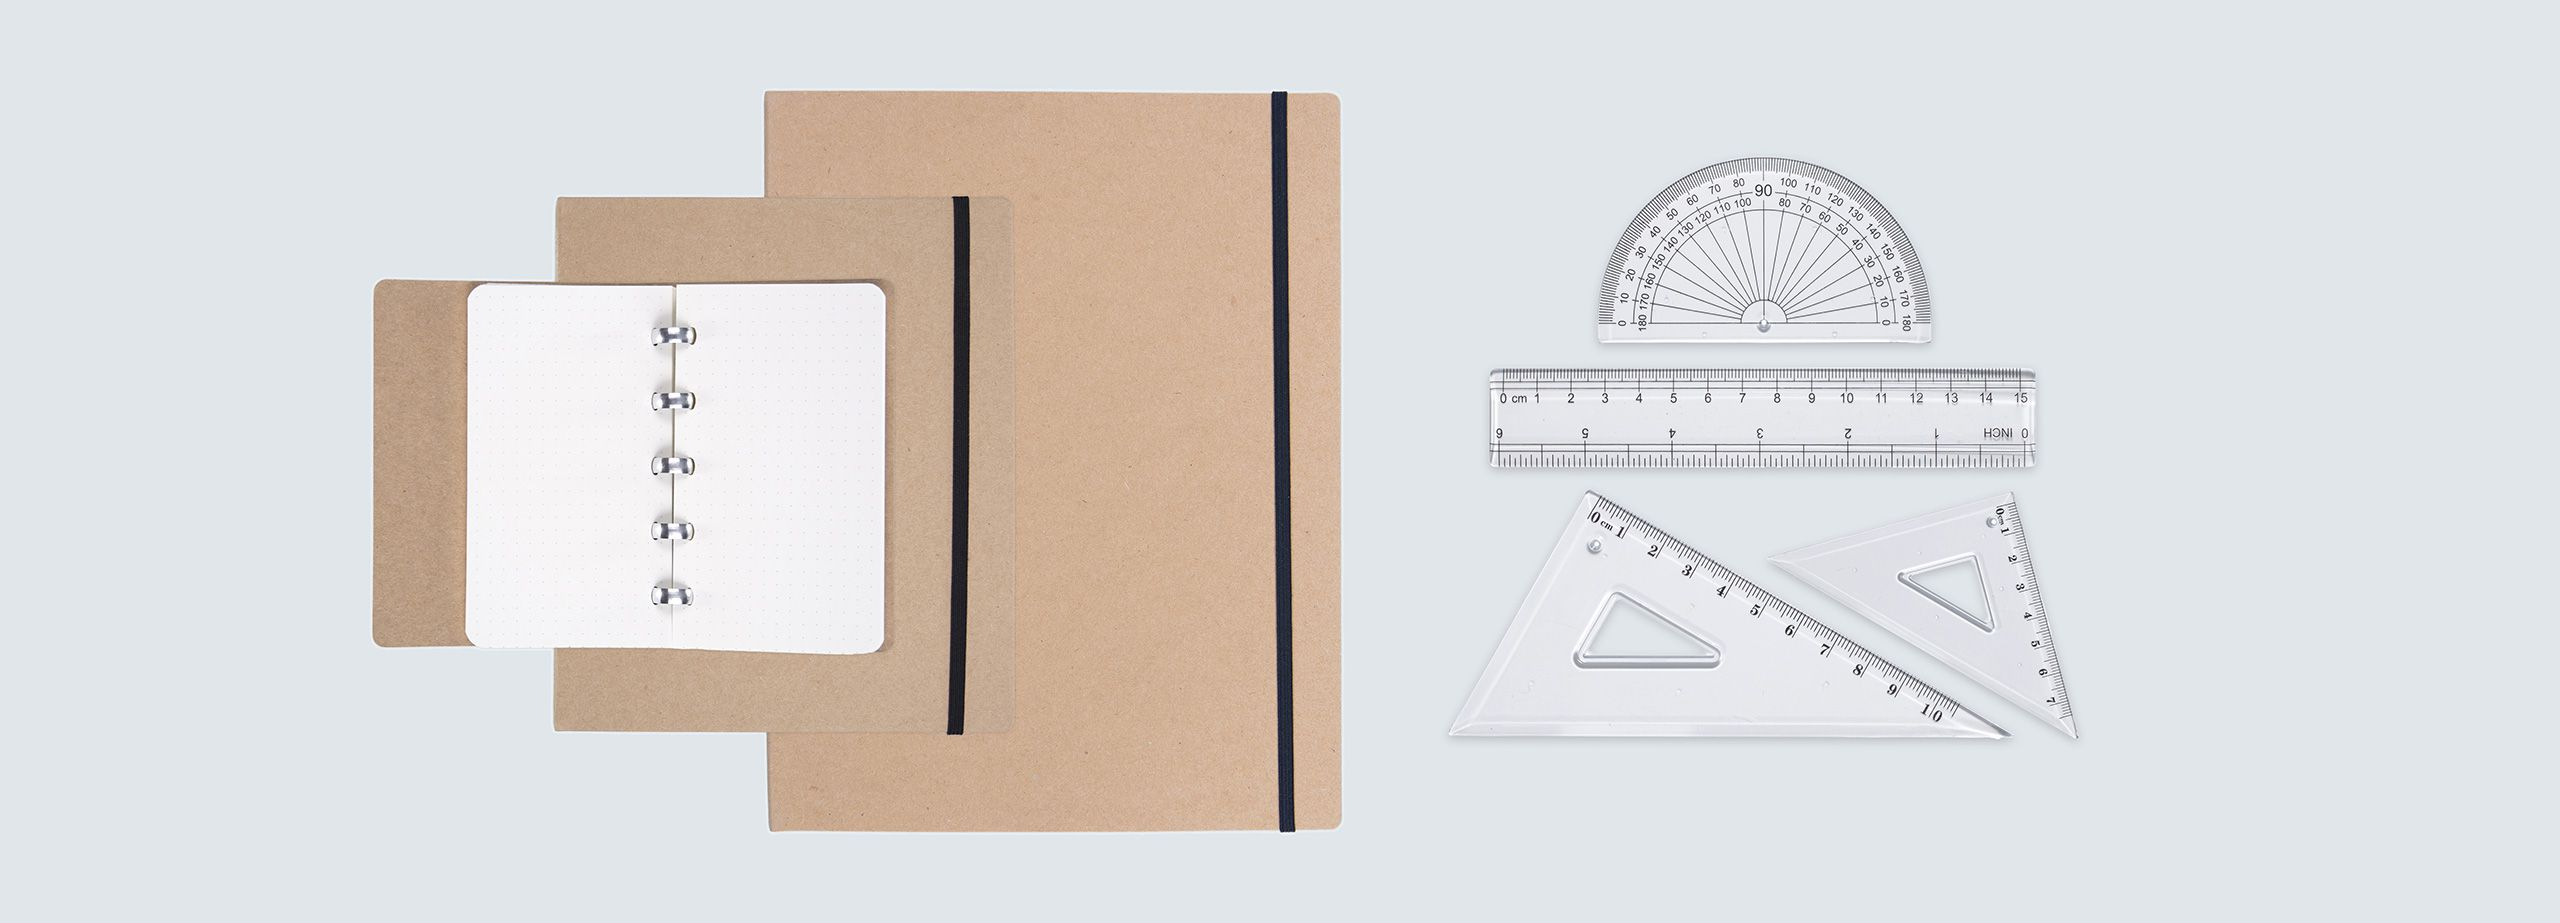 Atoma - Alain Berteau Cardboard